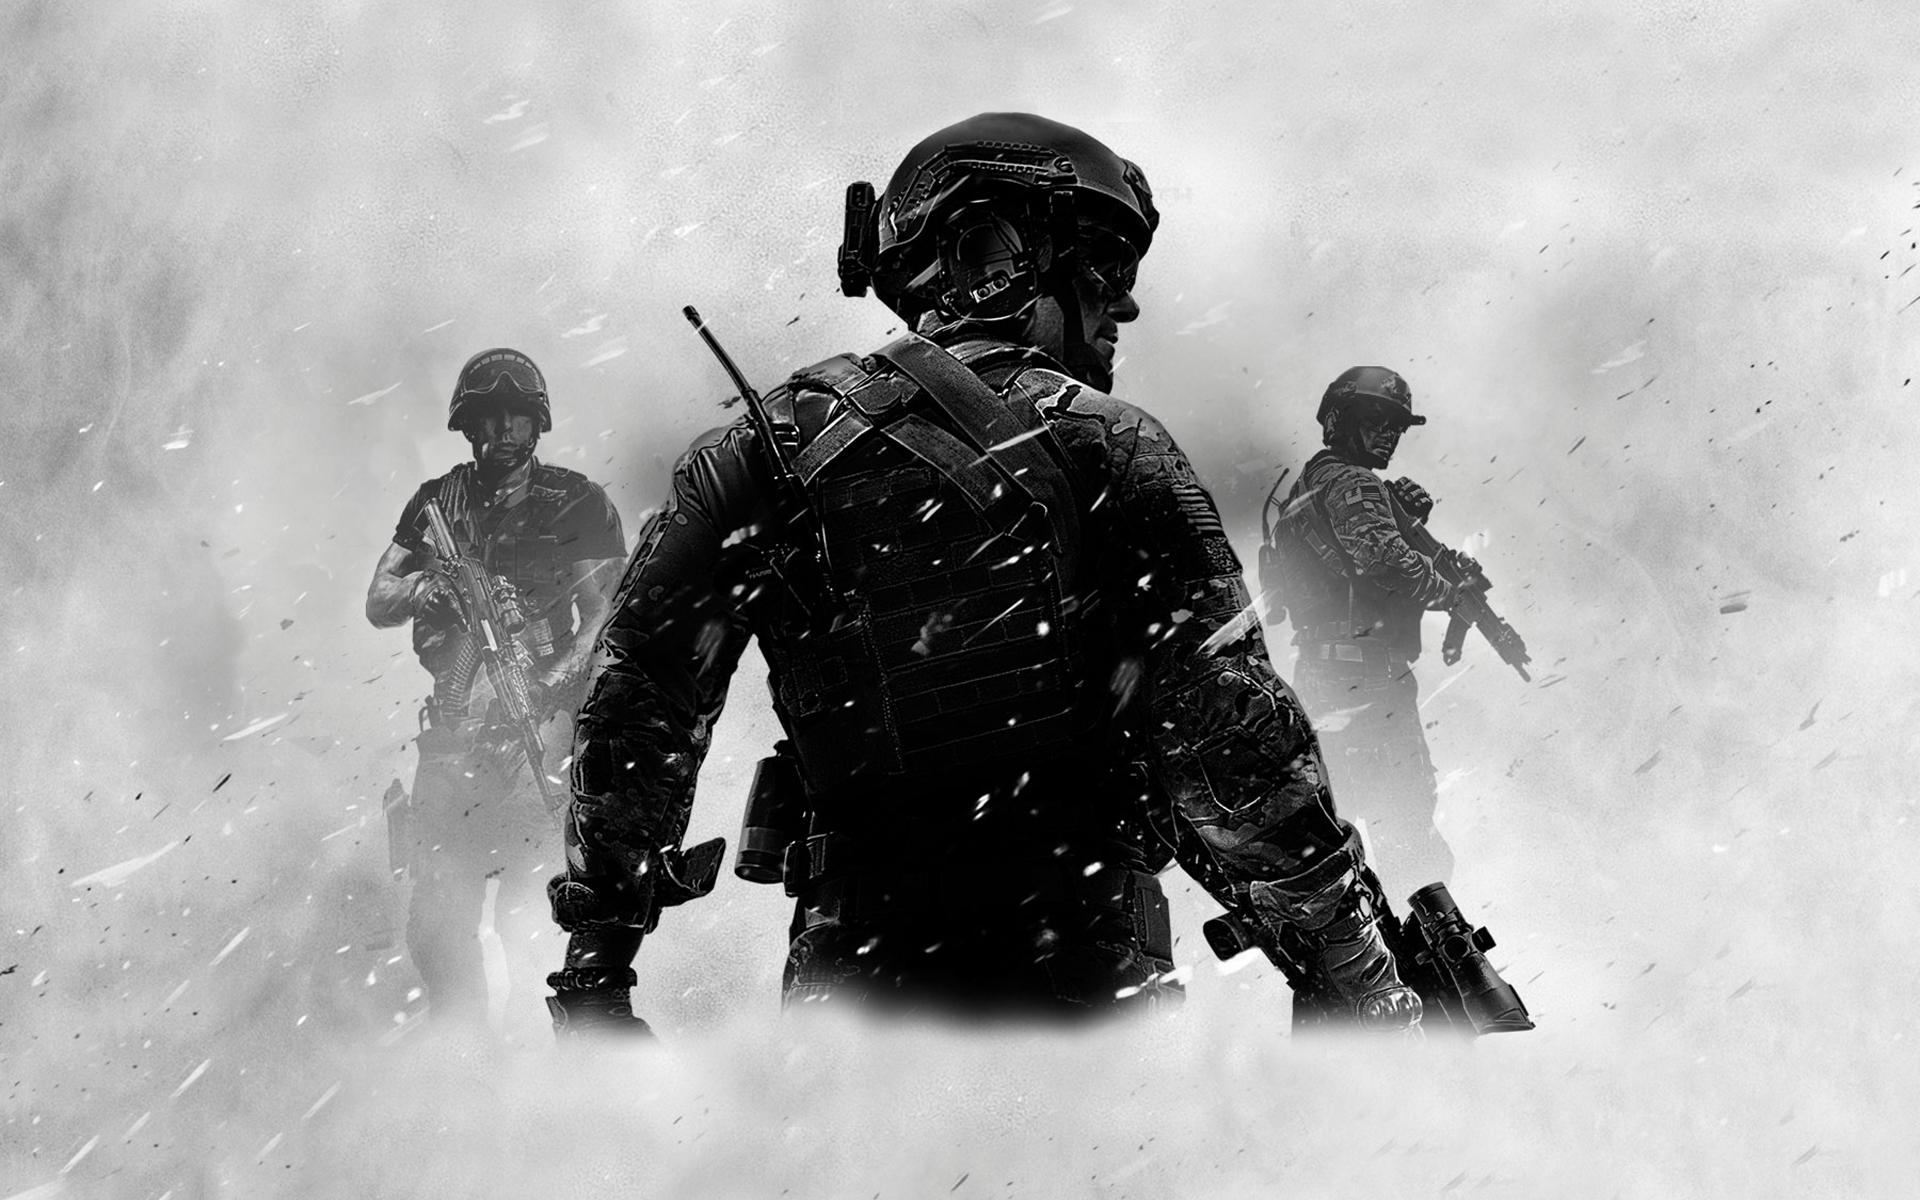 Call Of Duty Modern Warfare 3 Full HD Wallpaper And Background